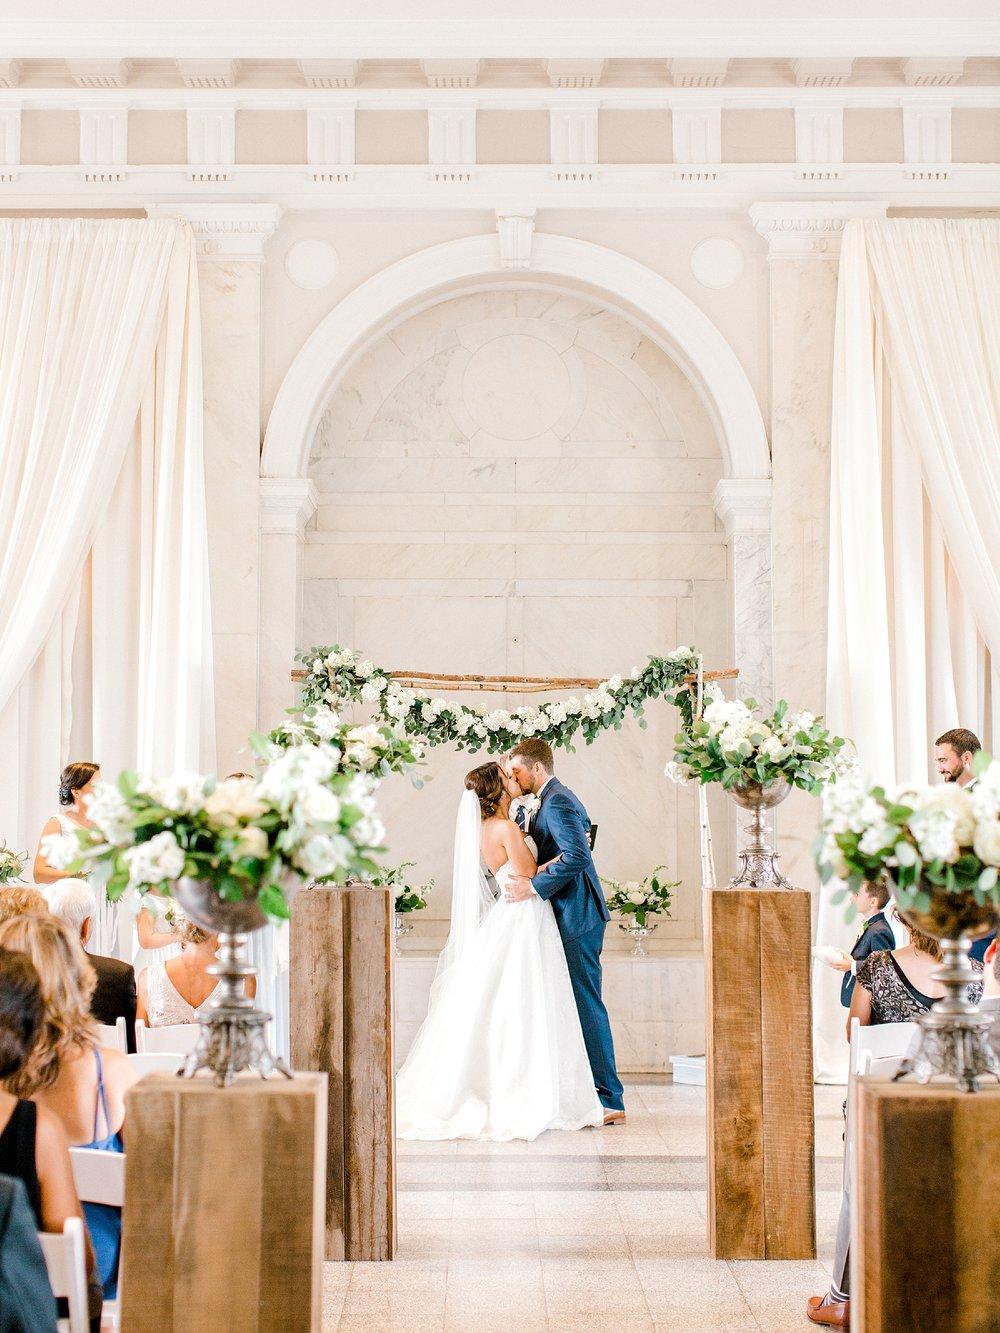 decatur-historic-dekalb-courthouse-photographer-christina-pugh (1 of 1)-41_dekalb-courthouse-wedding-photographer-christina-pugh.jpg